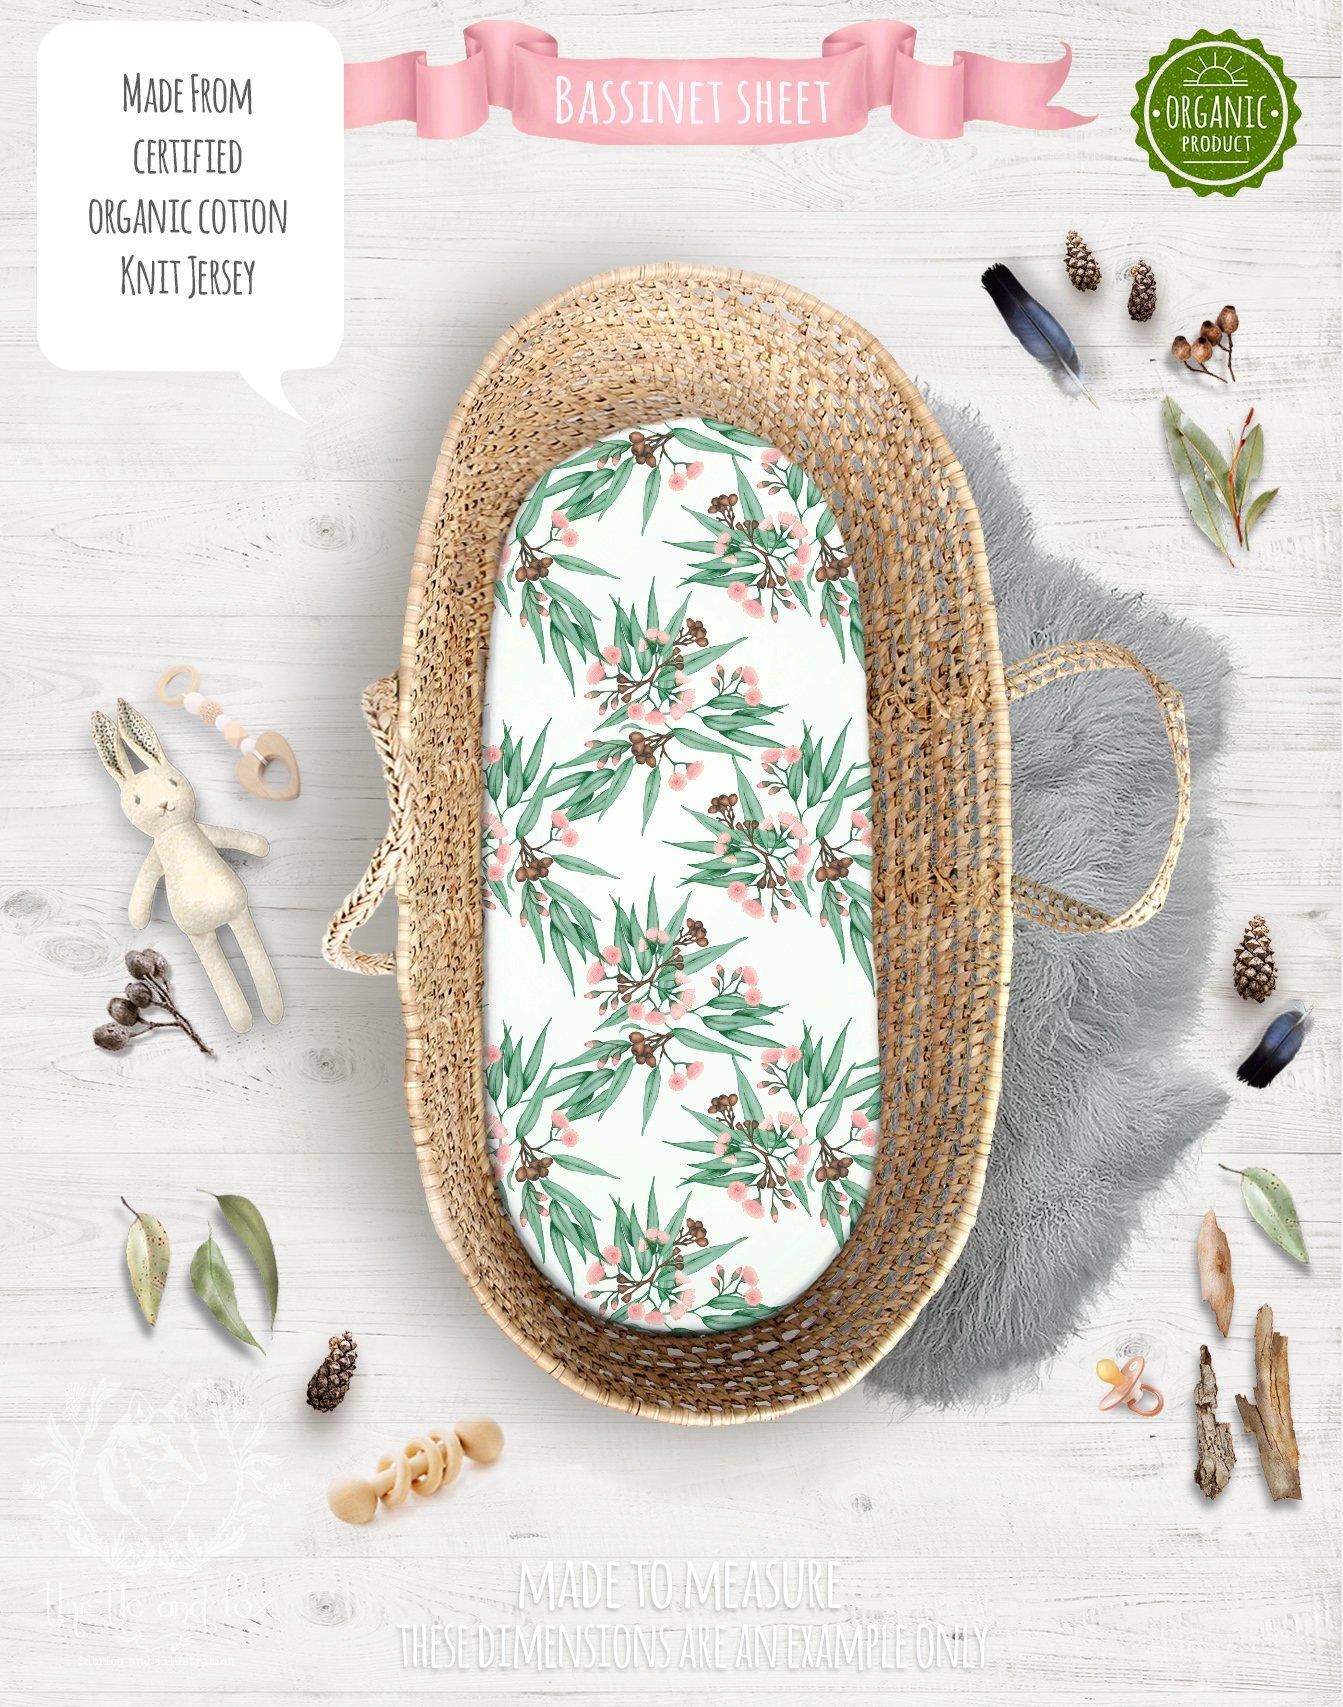 Australian Native Flora Fitted Bassinet Sheet in Soft Pink & Green